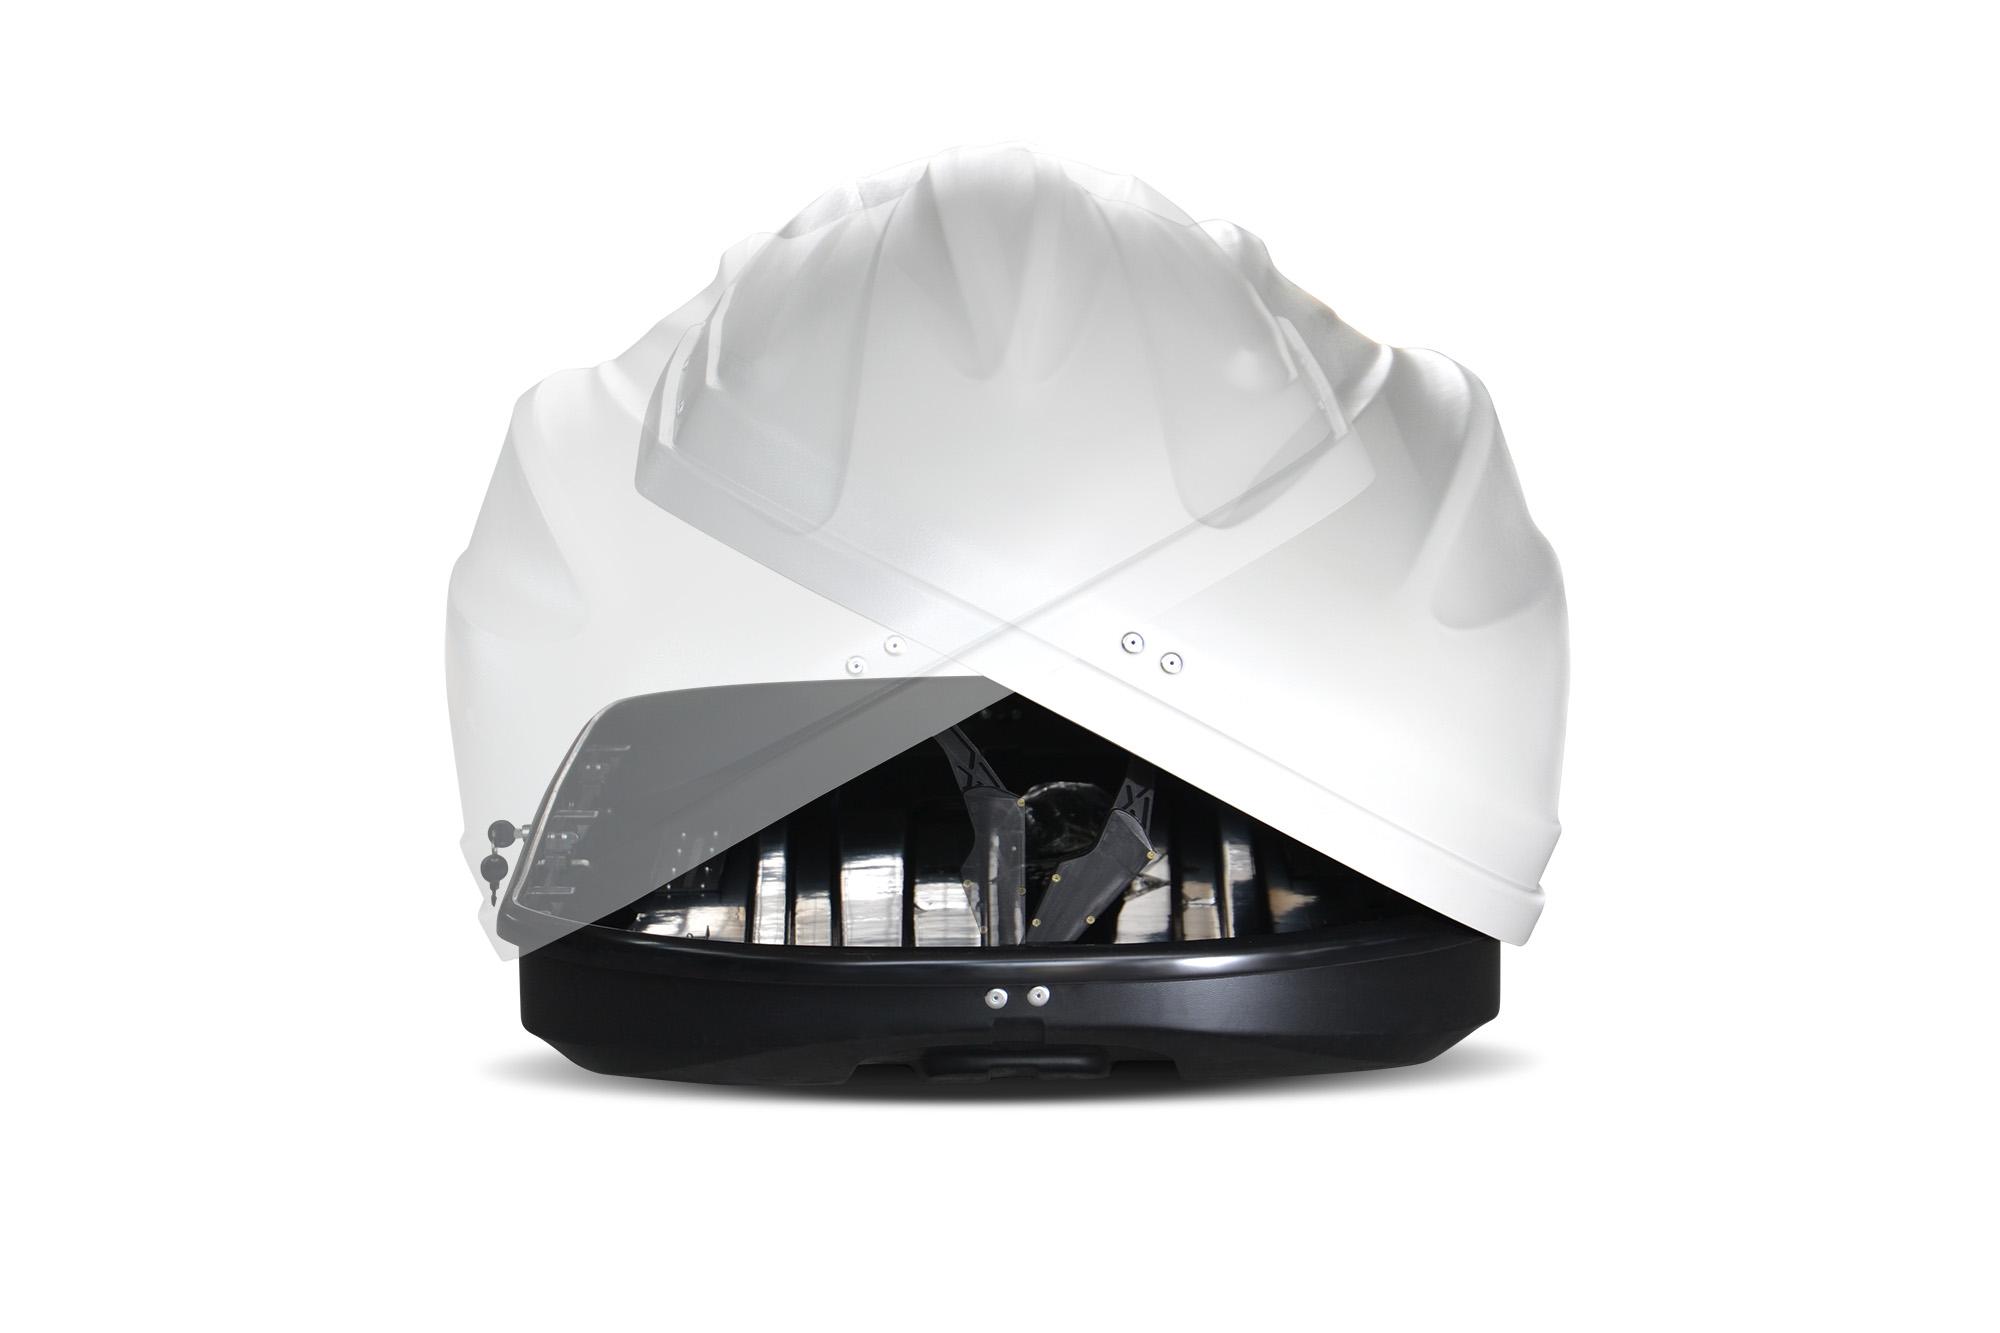 Автомобильный бокс на крышу Turino Compact Белый матовый DUO (Арт.2507)